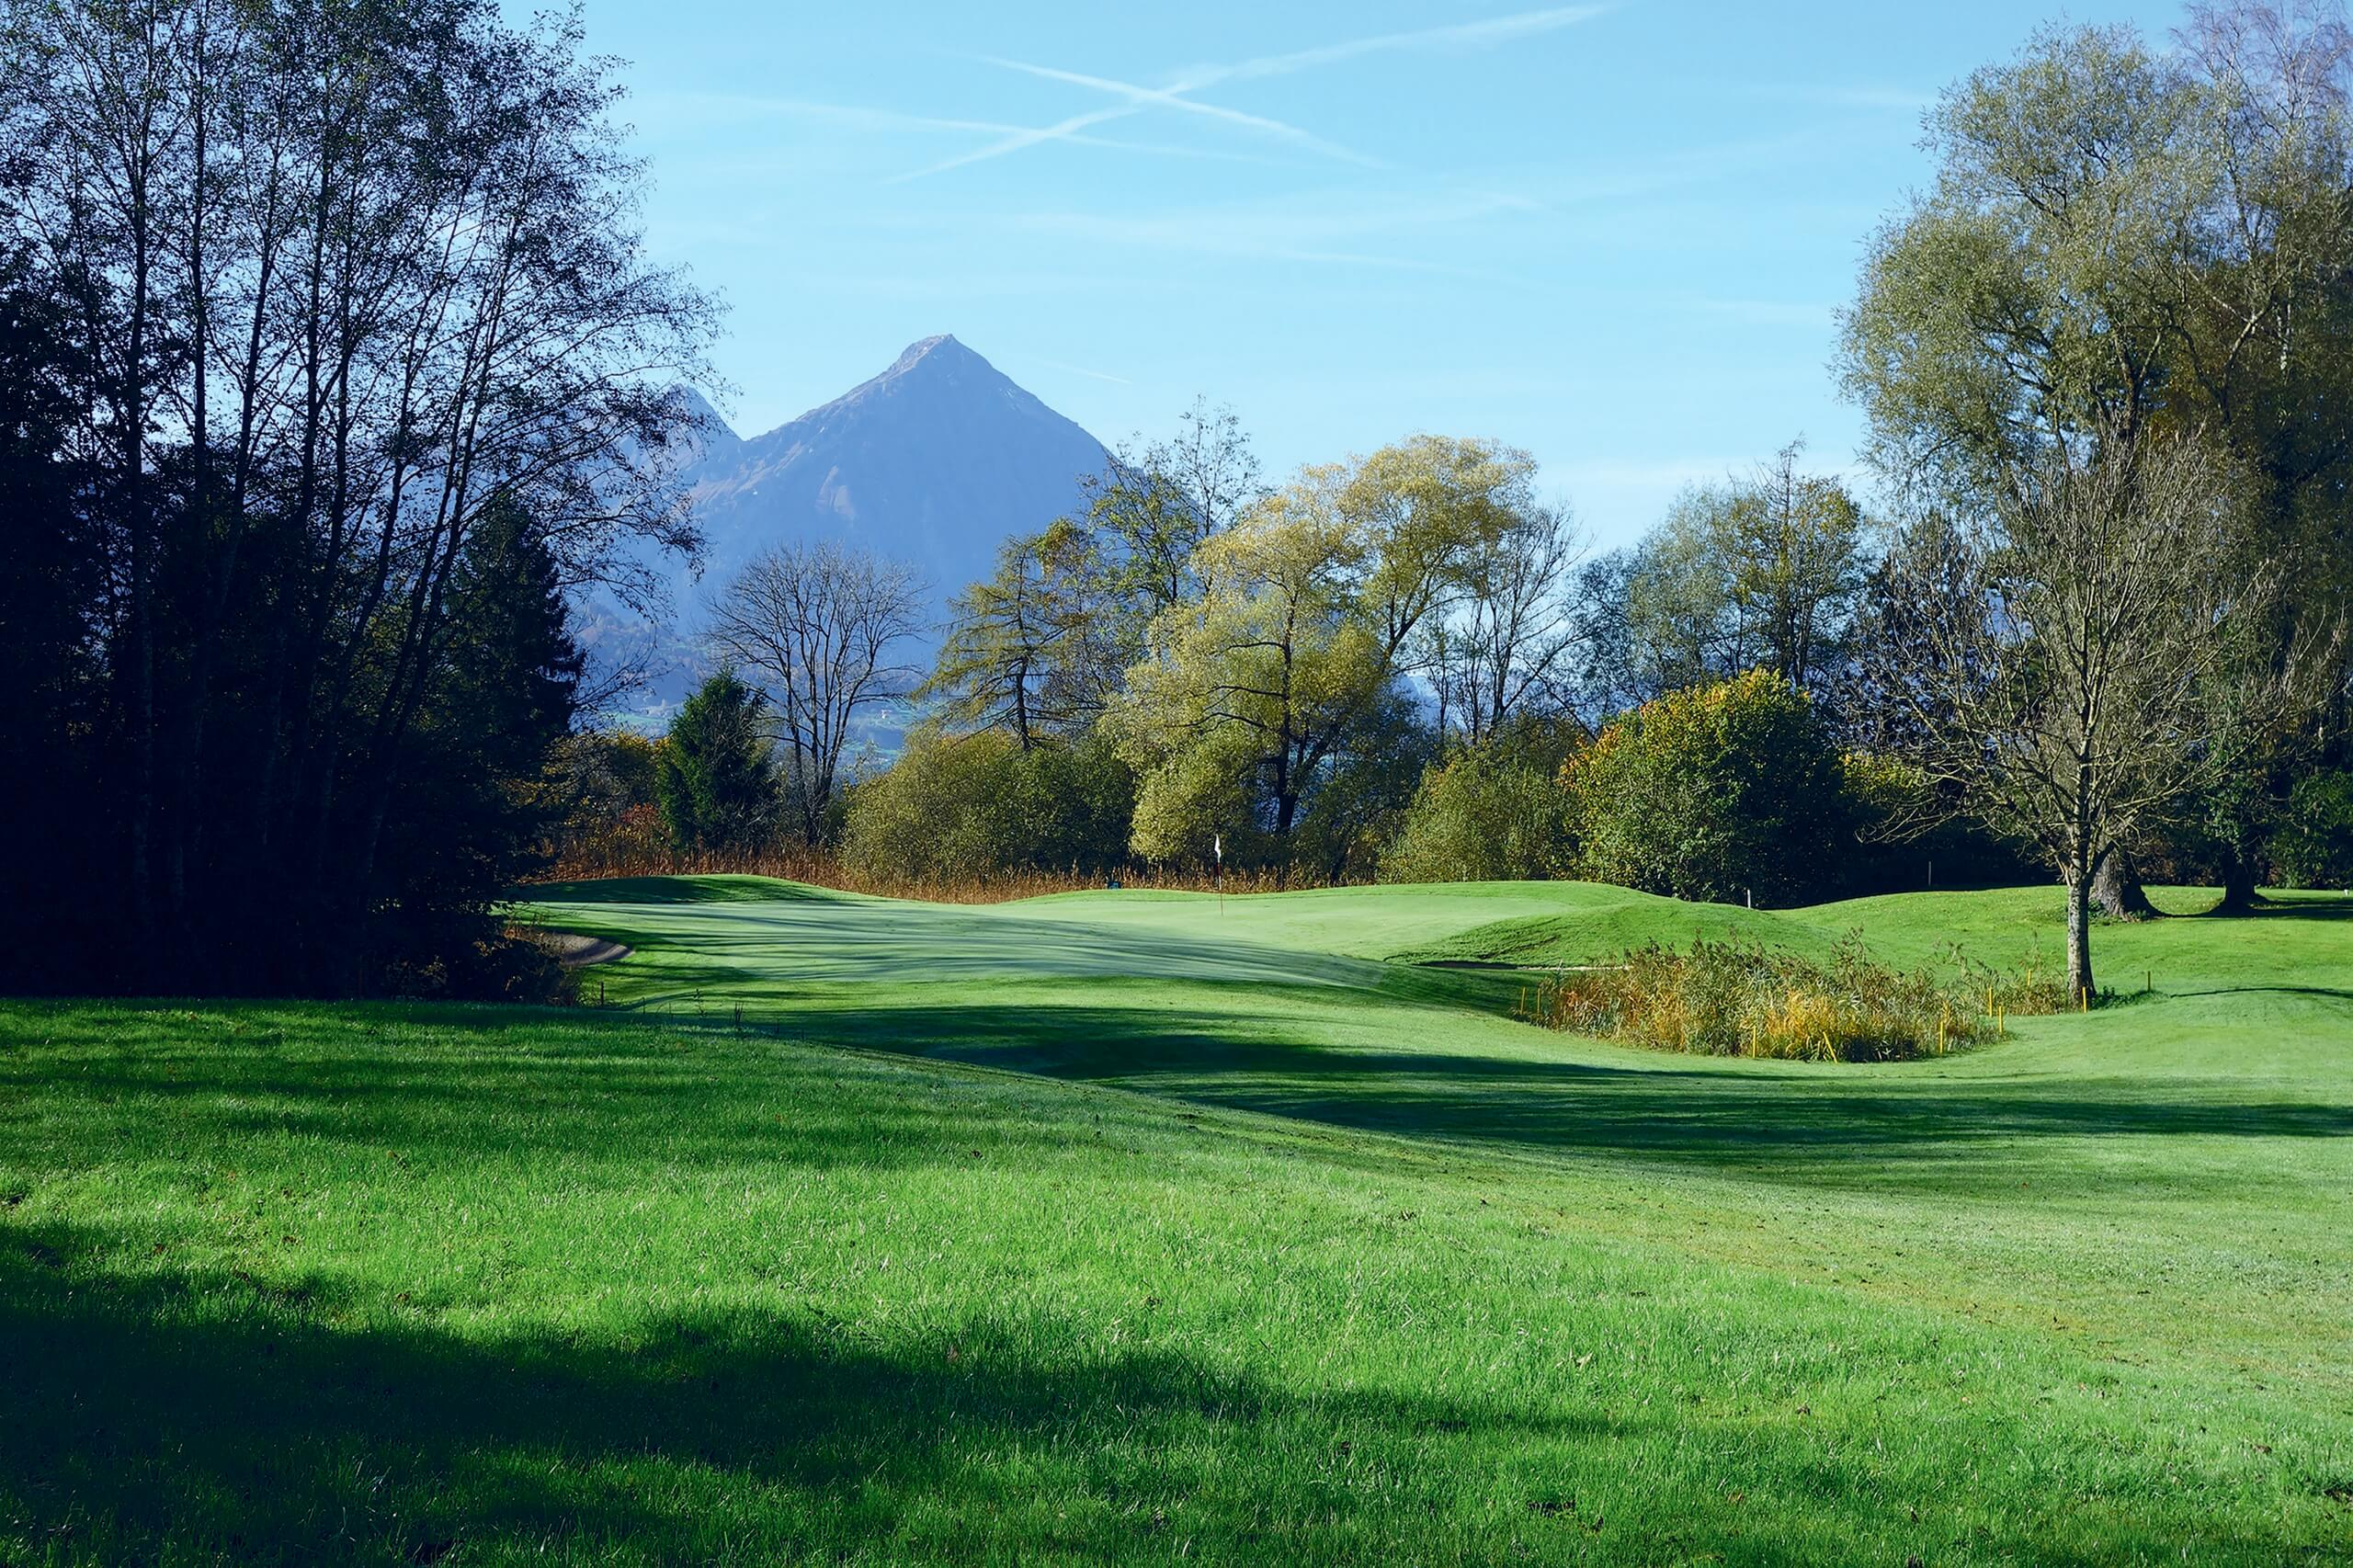 unterseen-golfplatz-sommer-baeume